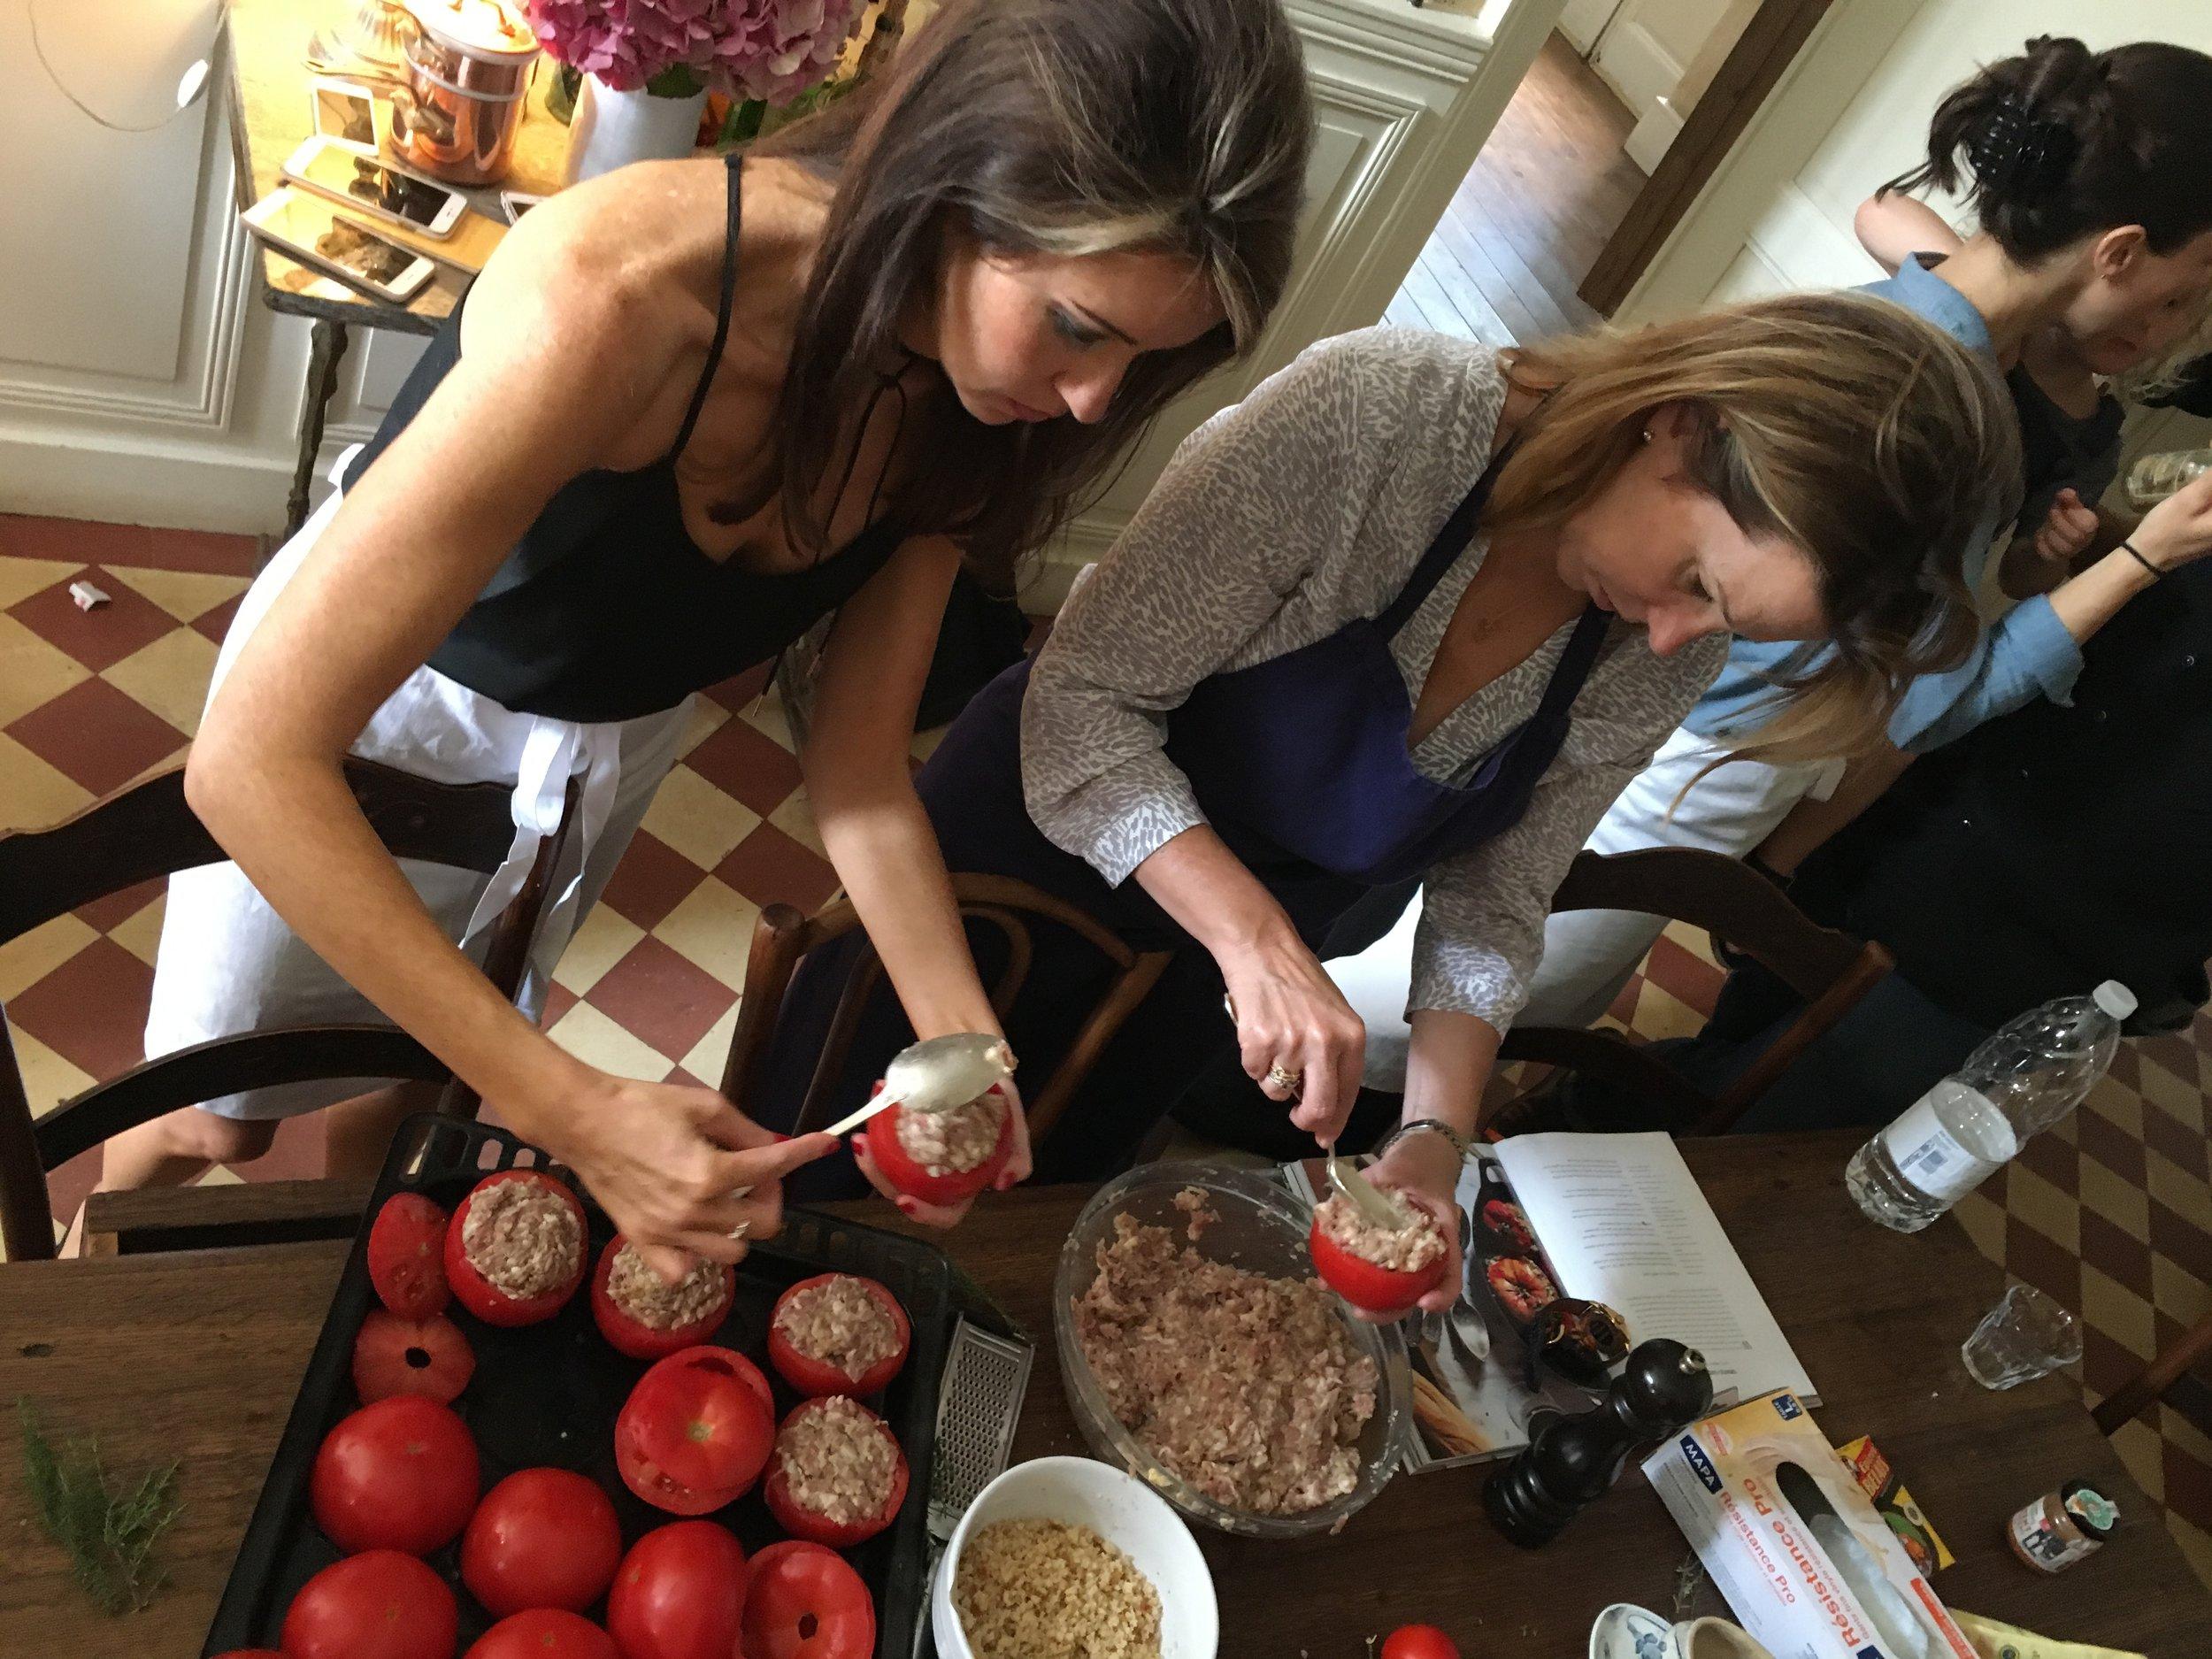 Making Stuffed Tomatoes in France 2017